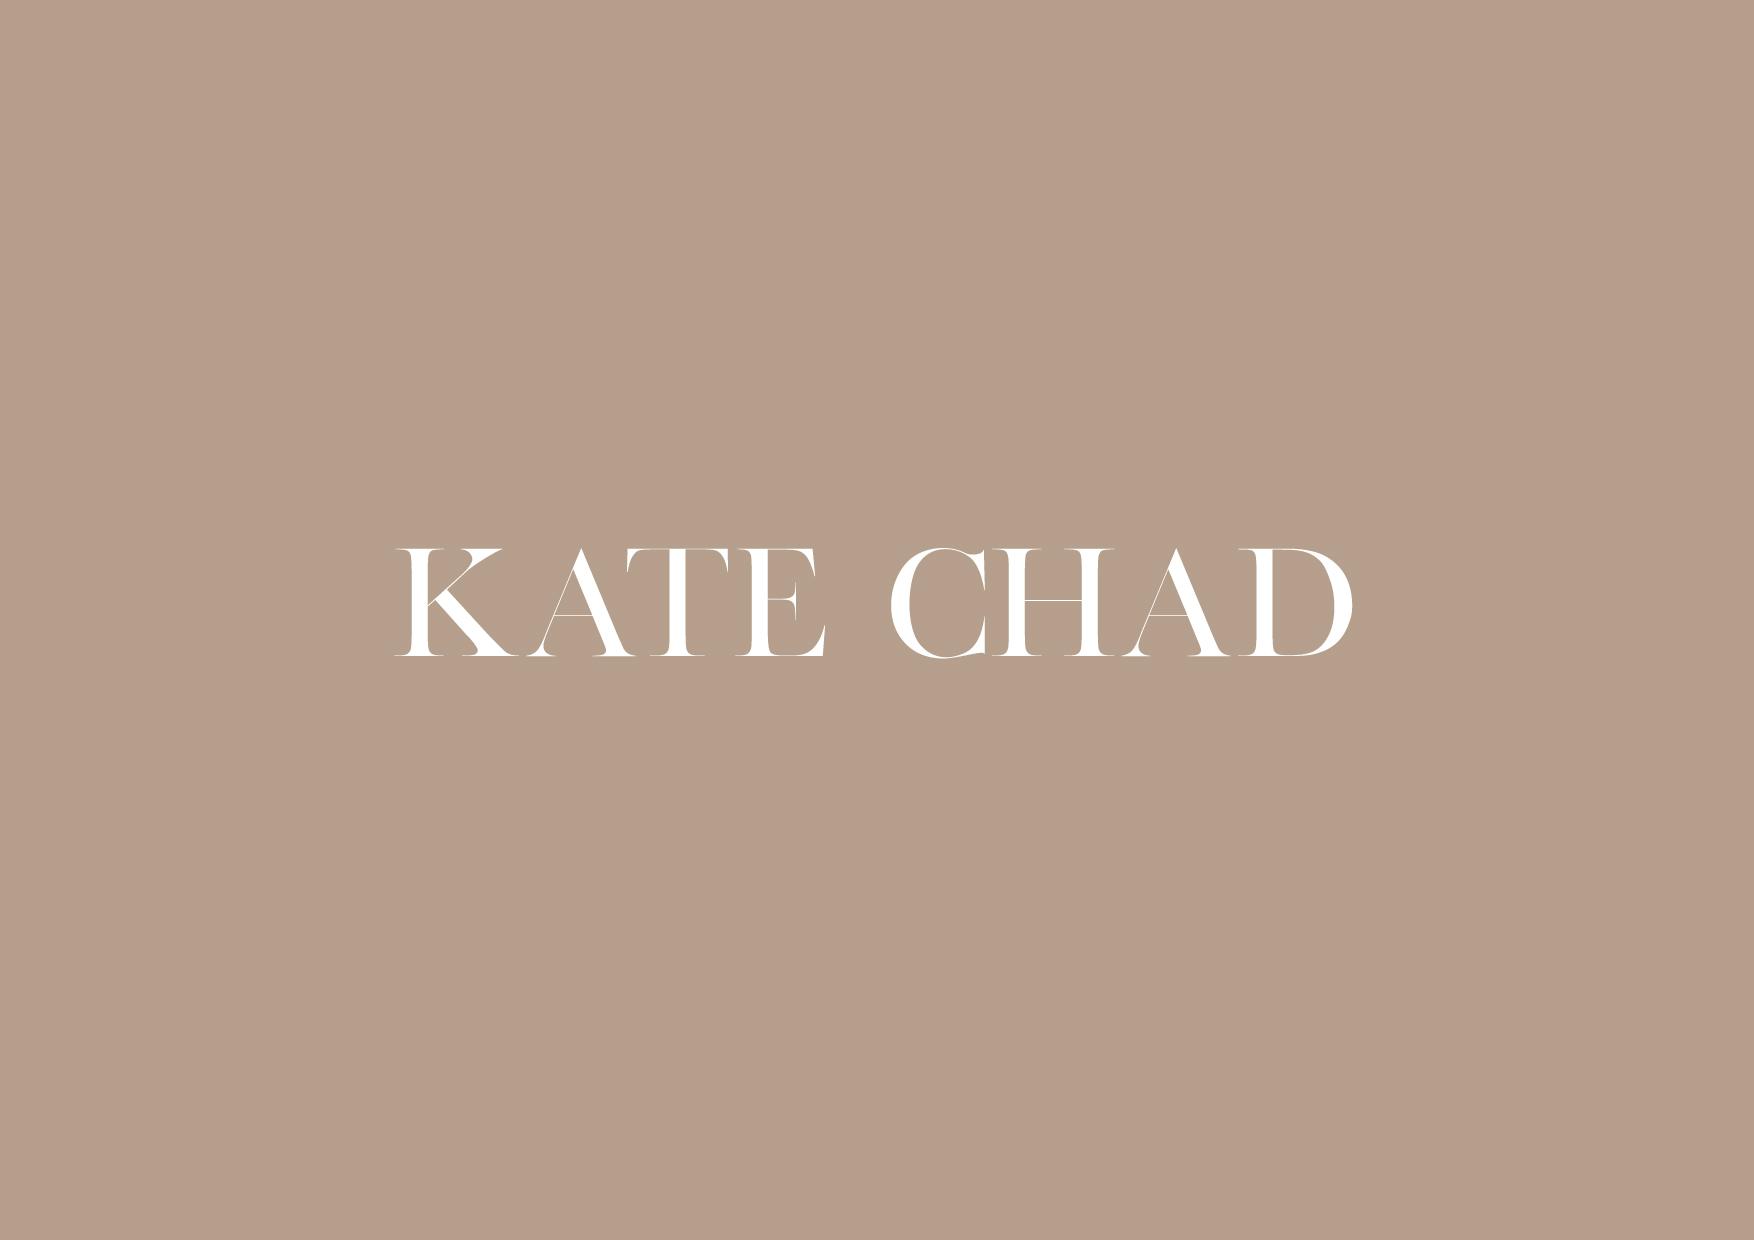 Kate Chad Logo Concept 2_7.jpg